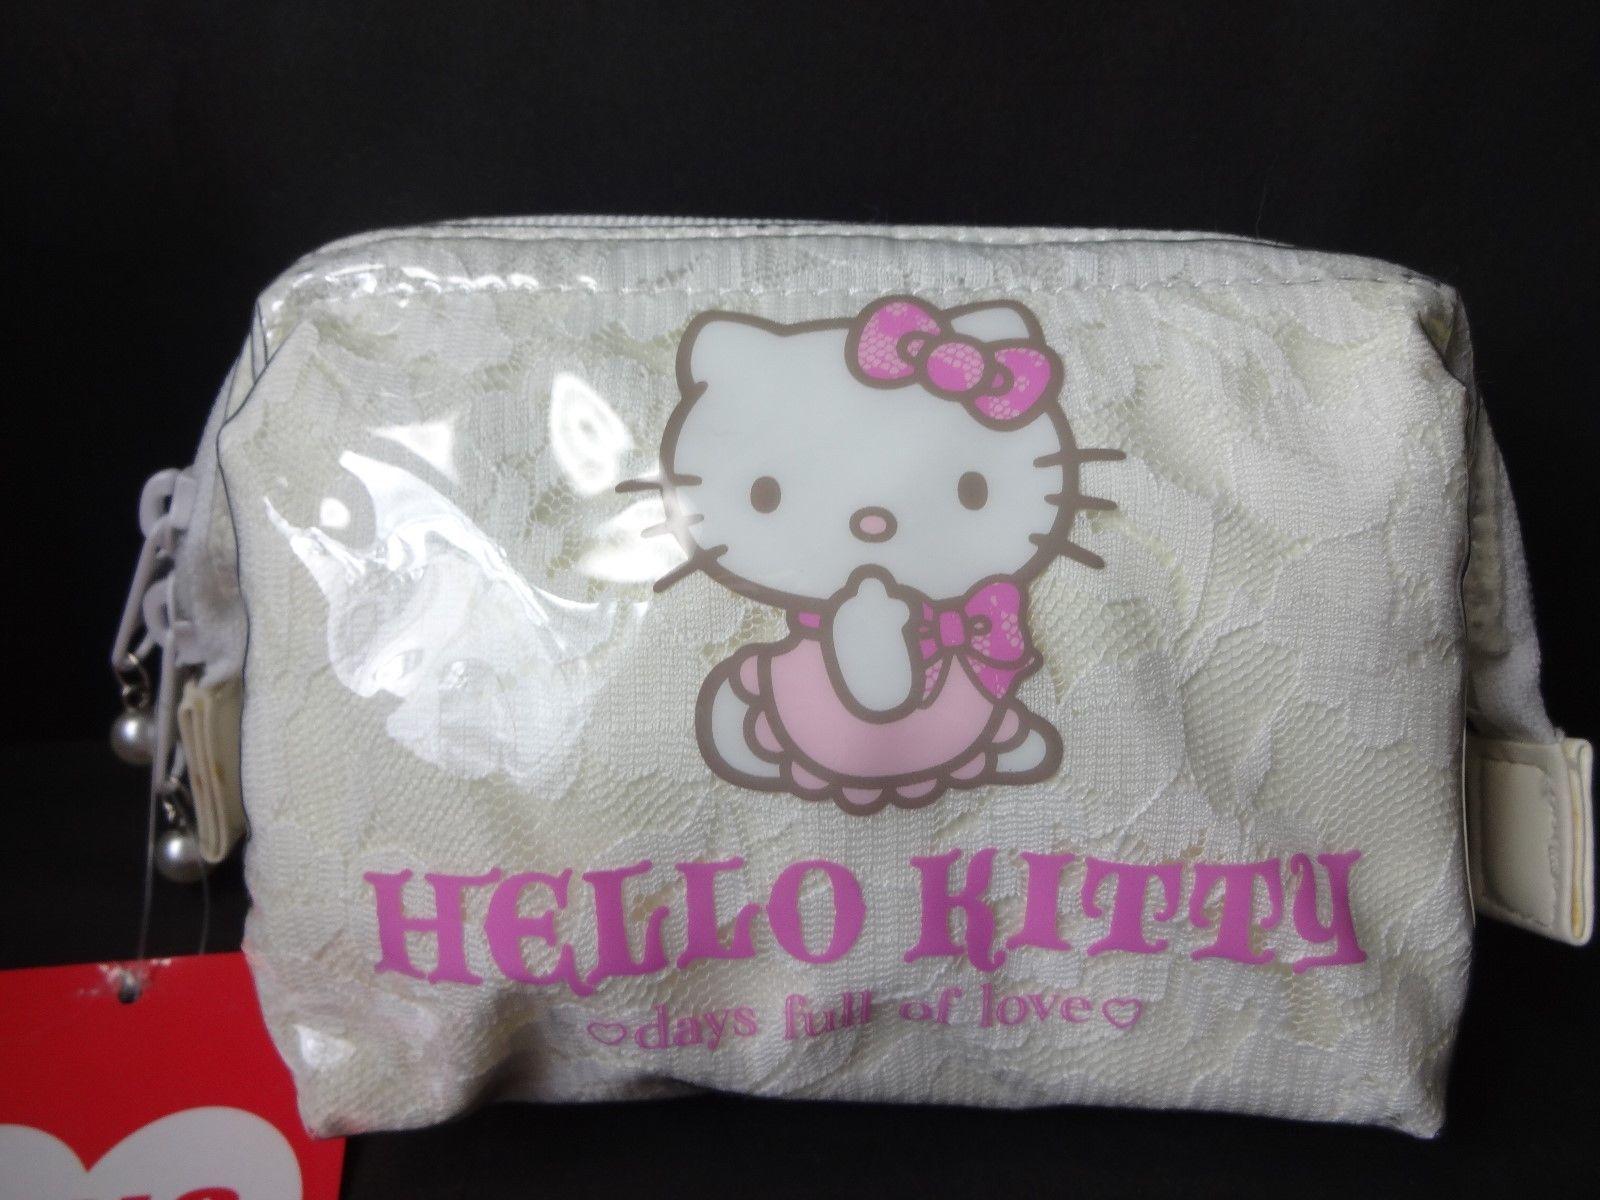 7a478e799 Sanrio Hello Kitty Purse Pouch Kawaii Free and 50 similar items. S l1600